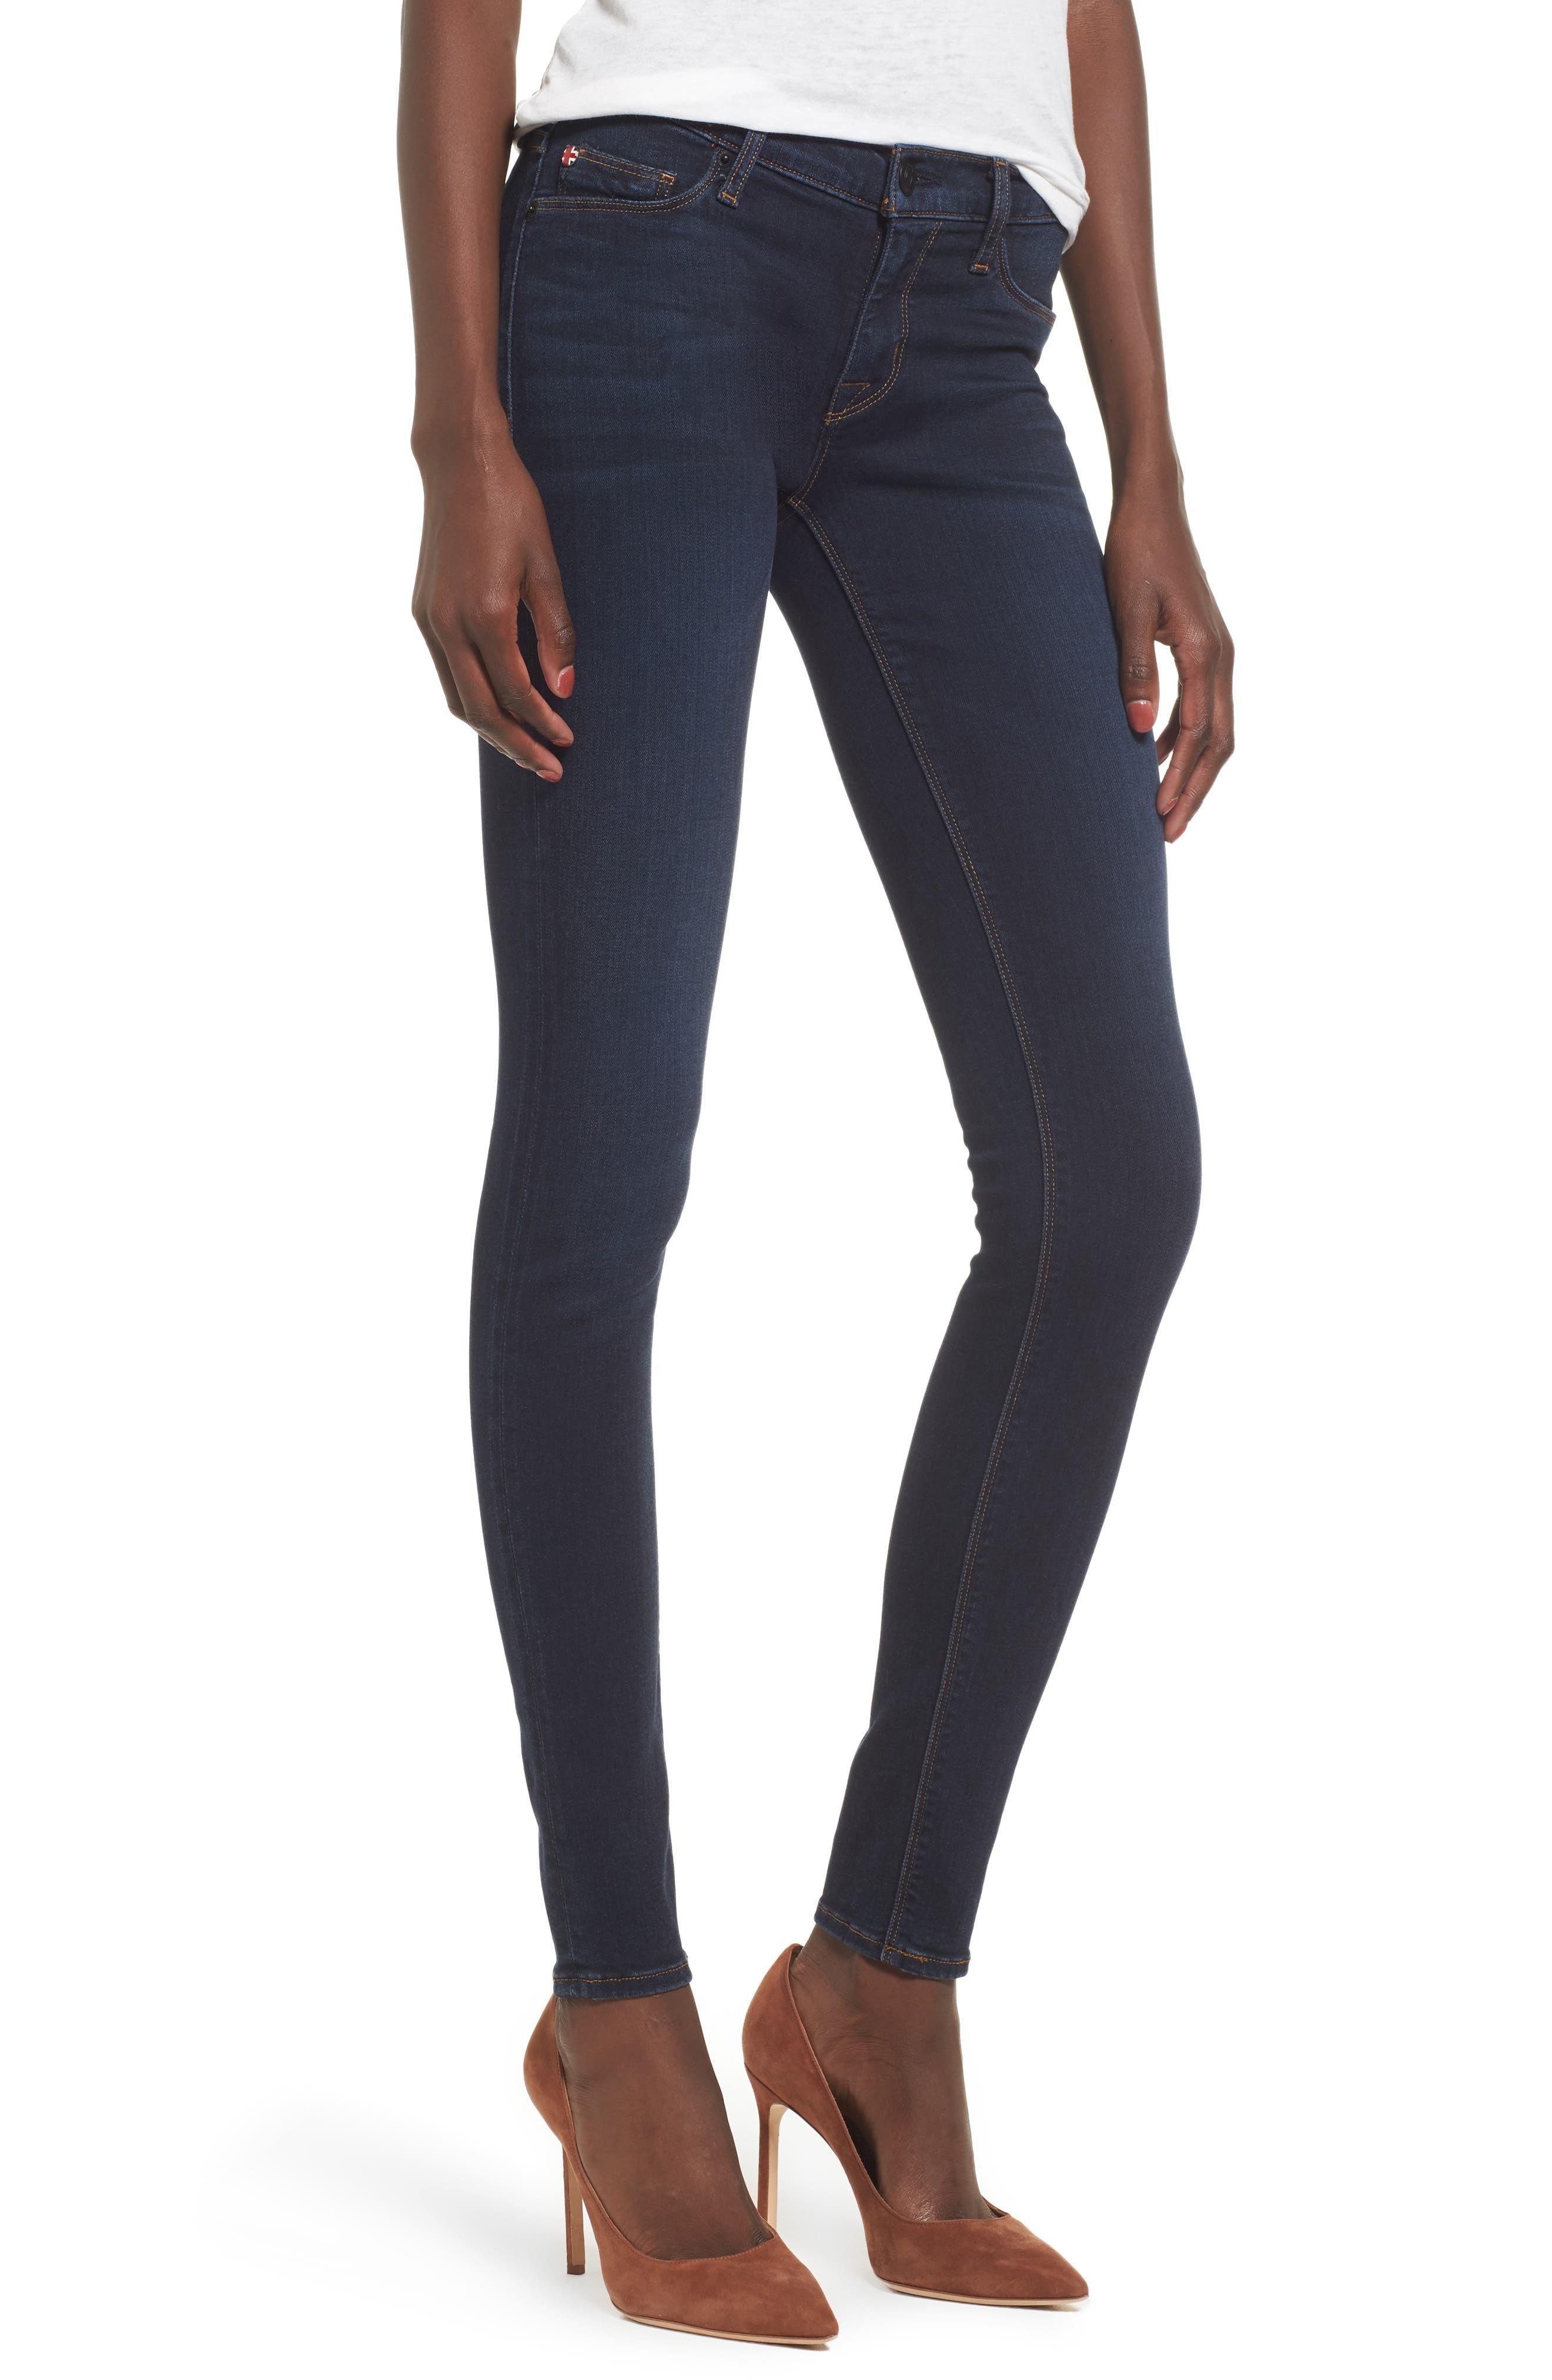 Alternate Image 1 Selected - Hudson Jeans 'Krista' Super Skinny Jeans (Skylark)